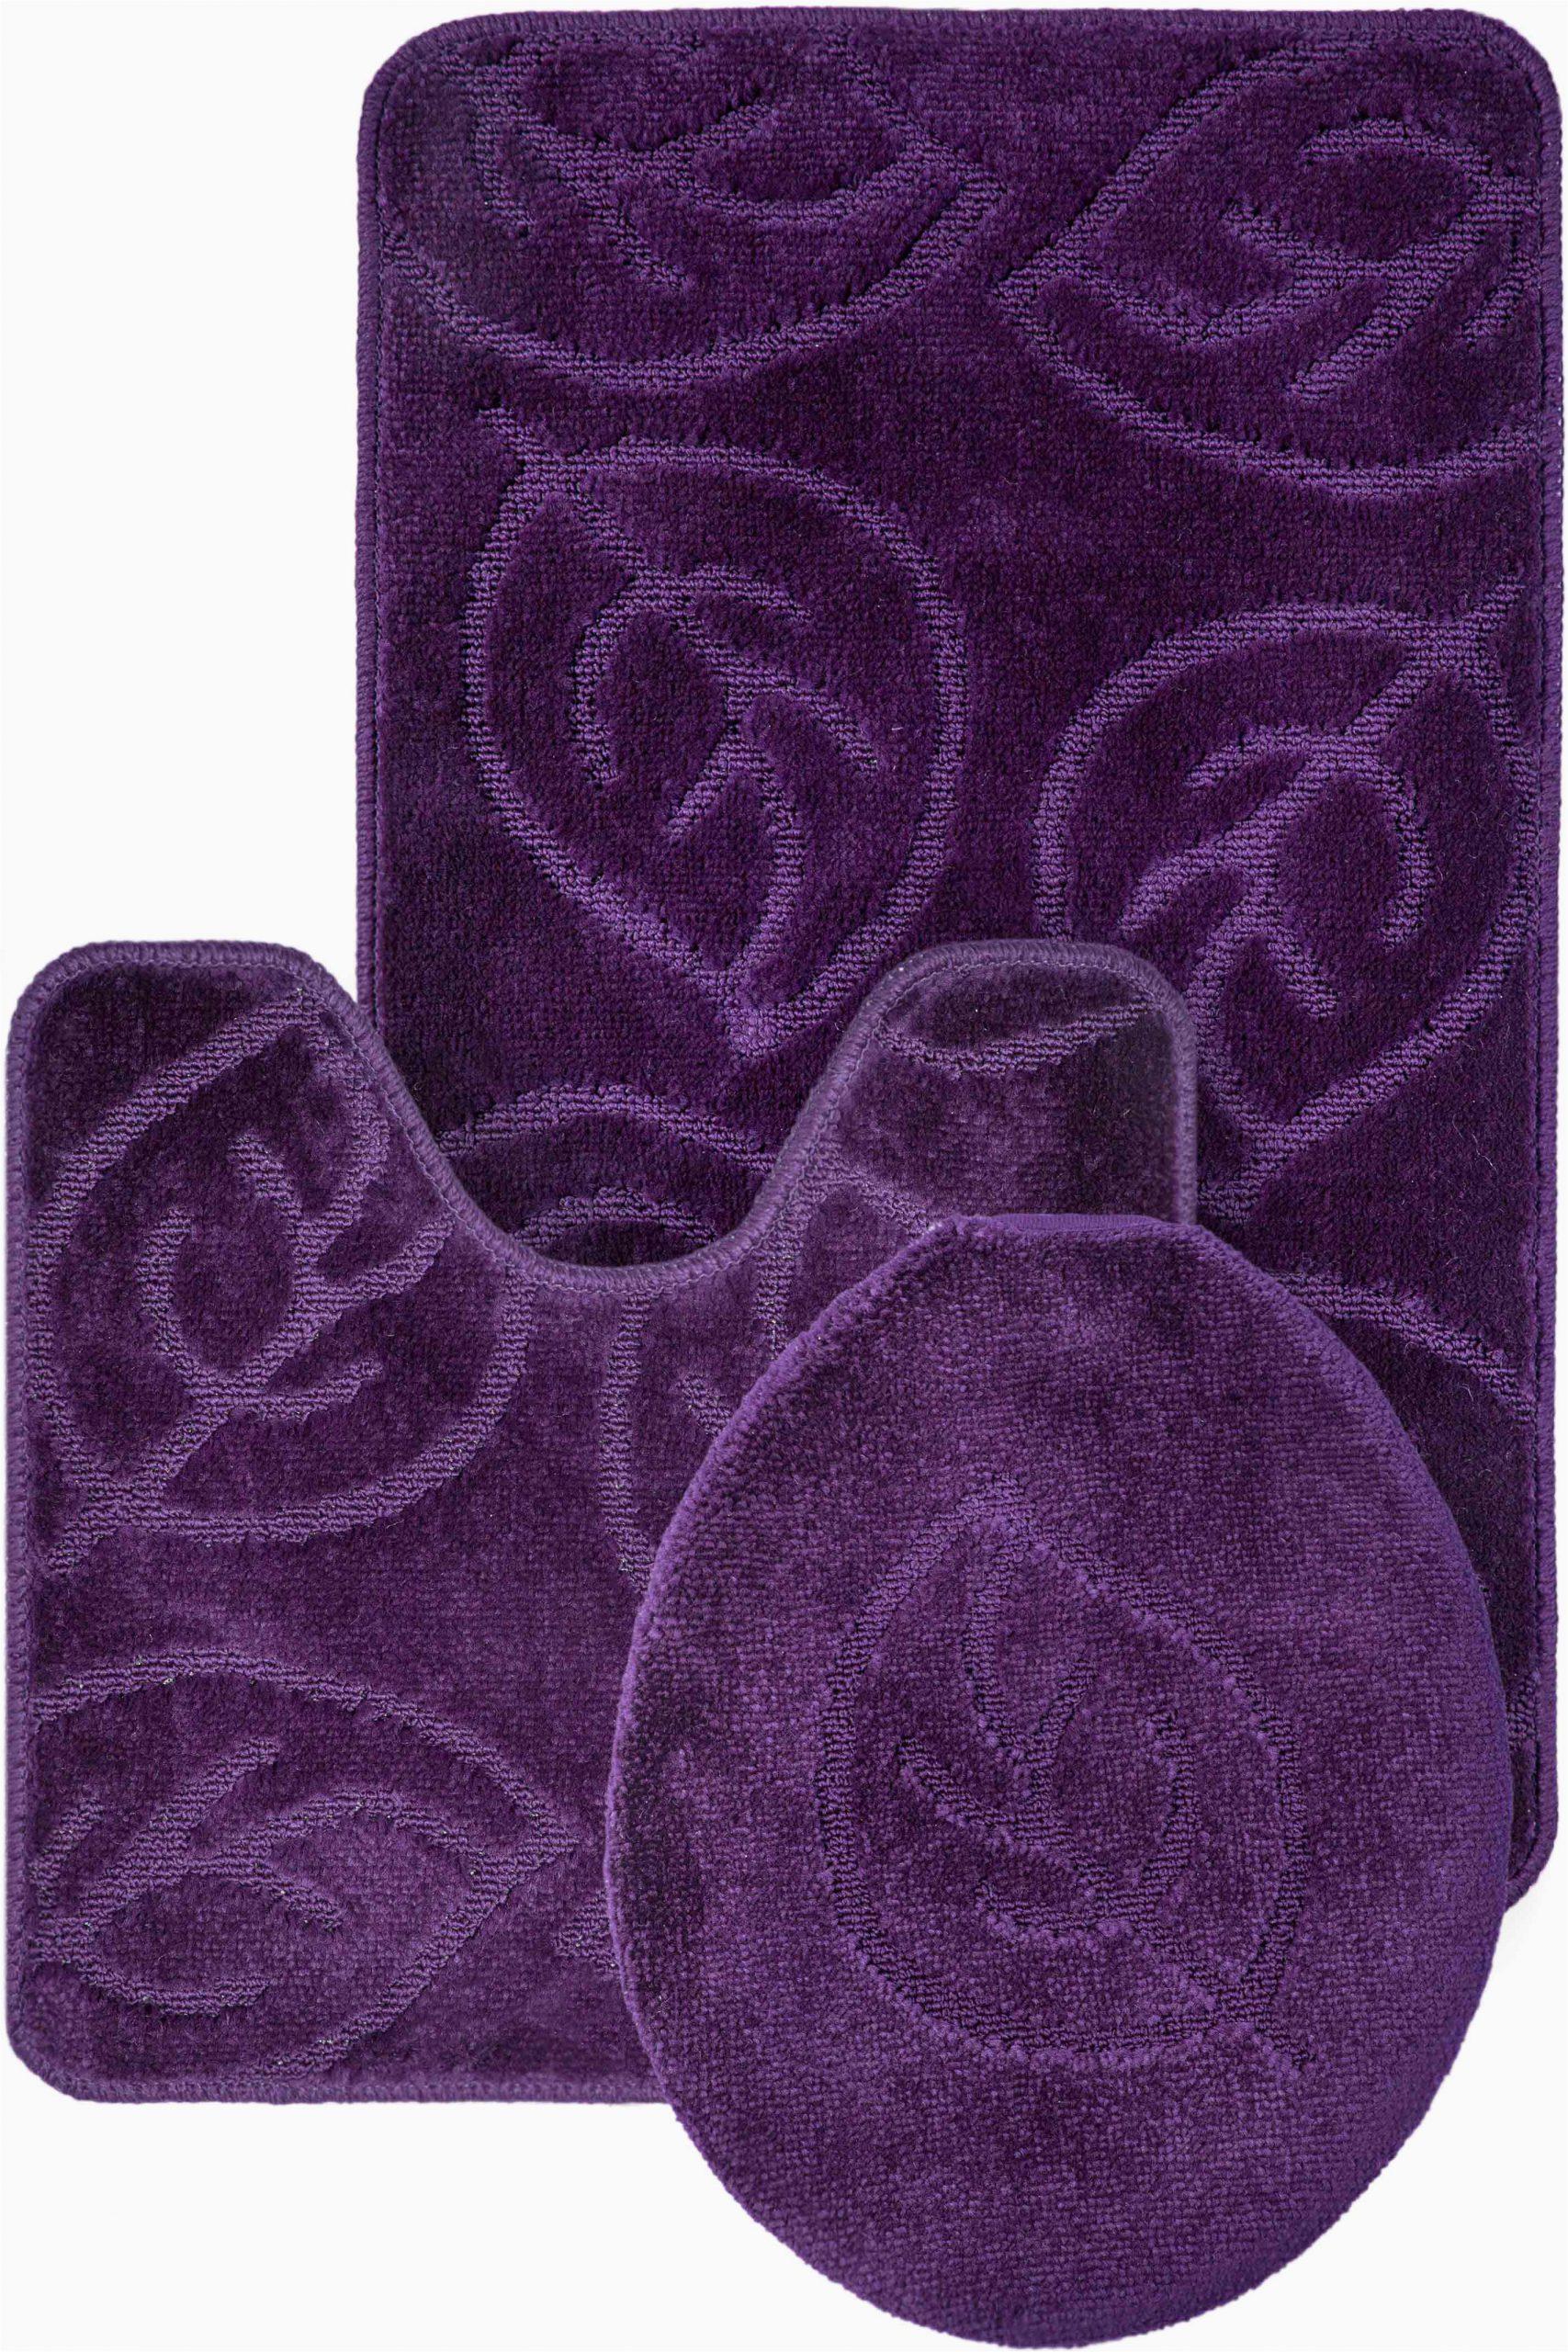 African Bathroom Rug Set Purple Bathroom Rug Set Image Of Bathroom and Closet